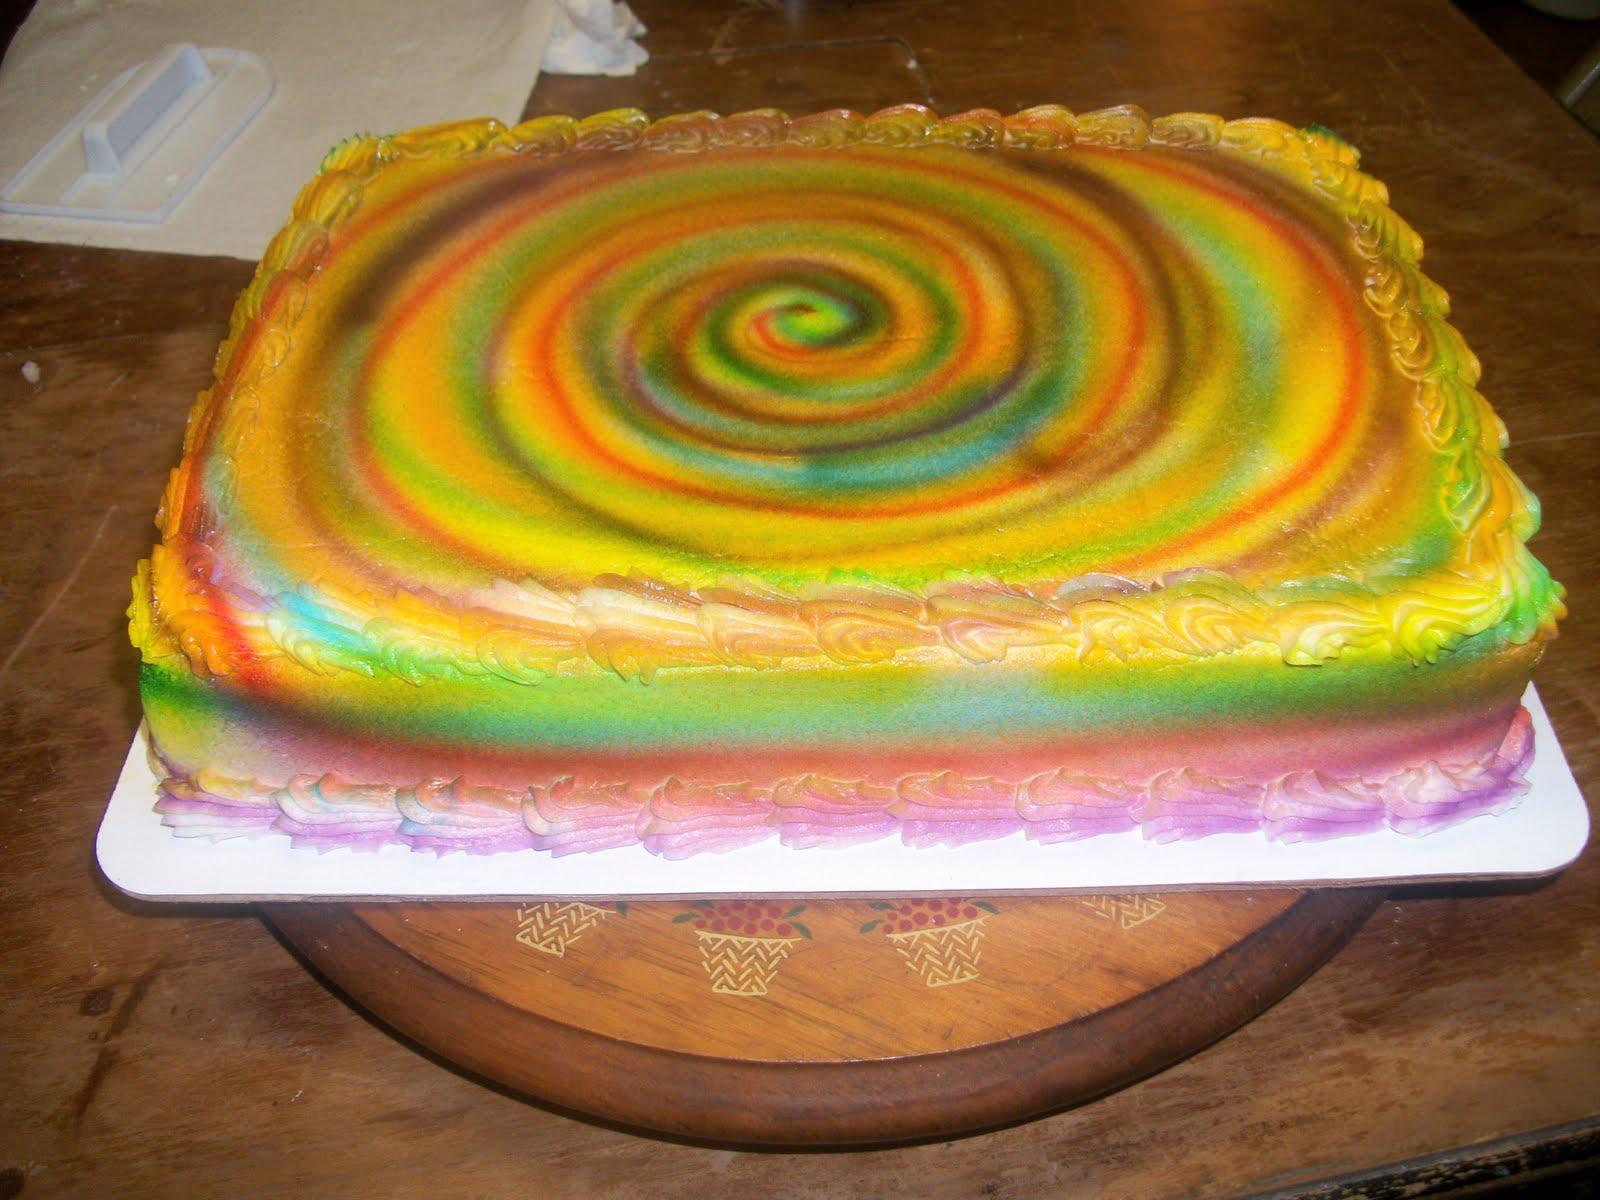 Tasty Cakes 70s Tie Dye Cake